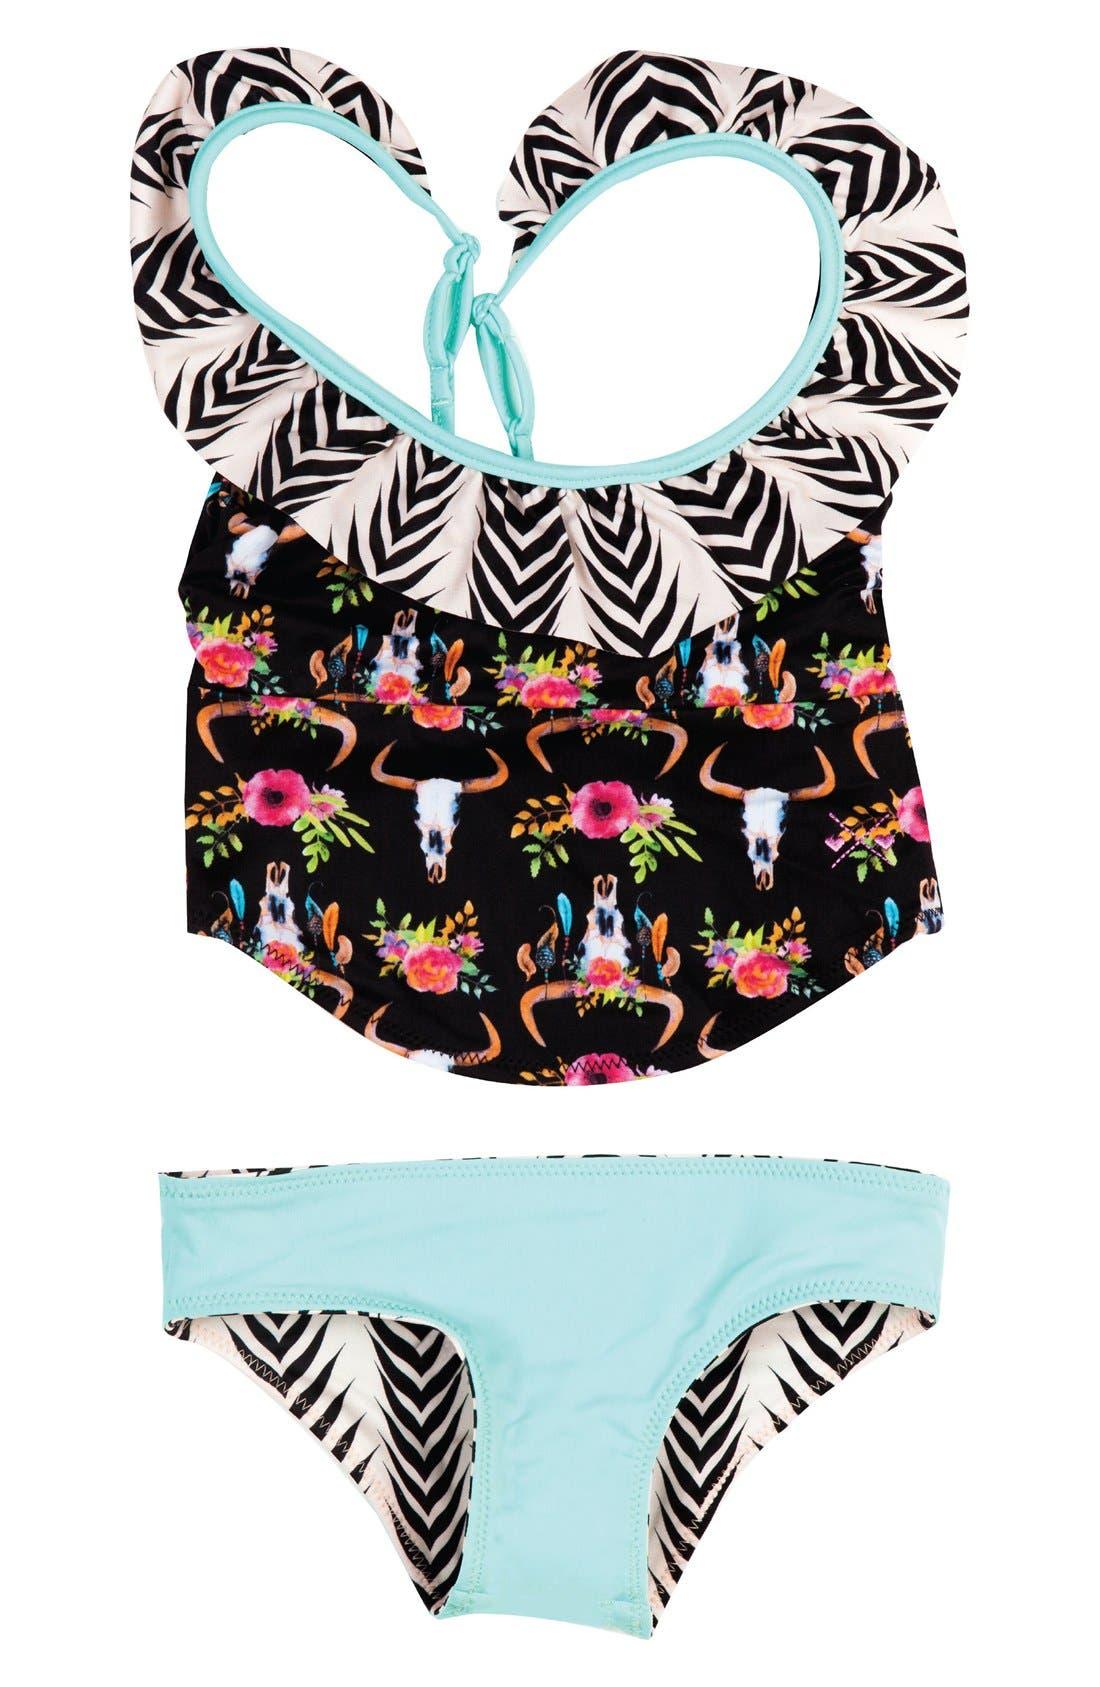 Main Image - BOWIE X JAMES Dreamcatcher Two-Piece Tankini Swimsuit (Toddler Girls, Little Girls & Big Girls)